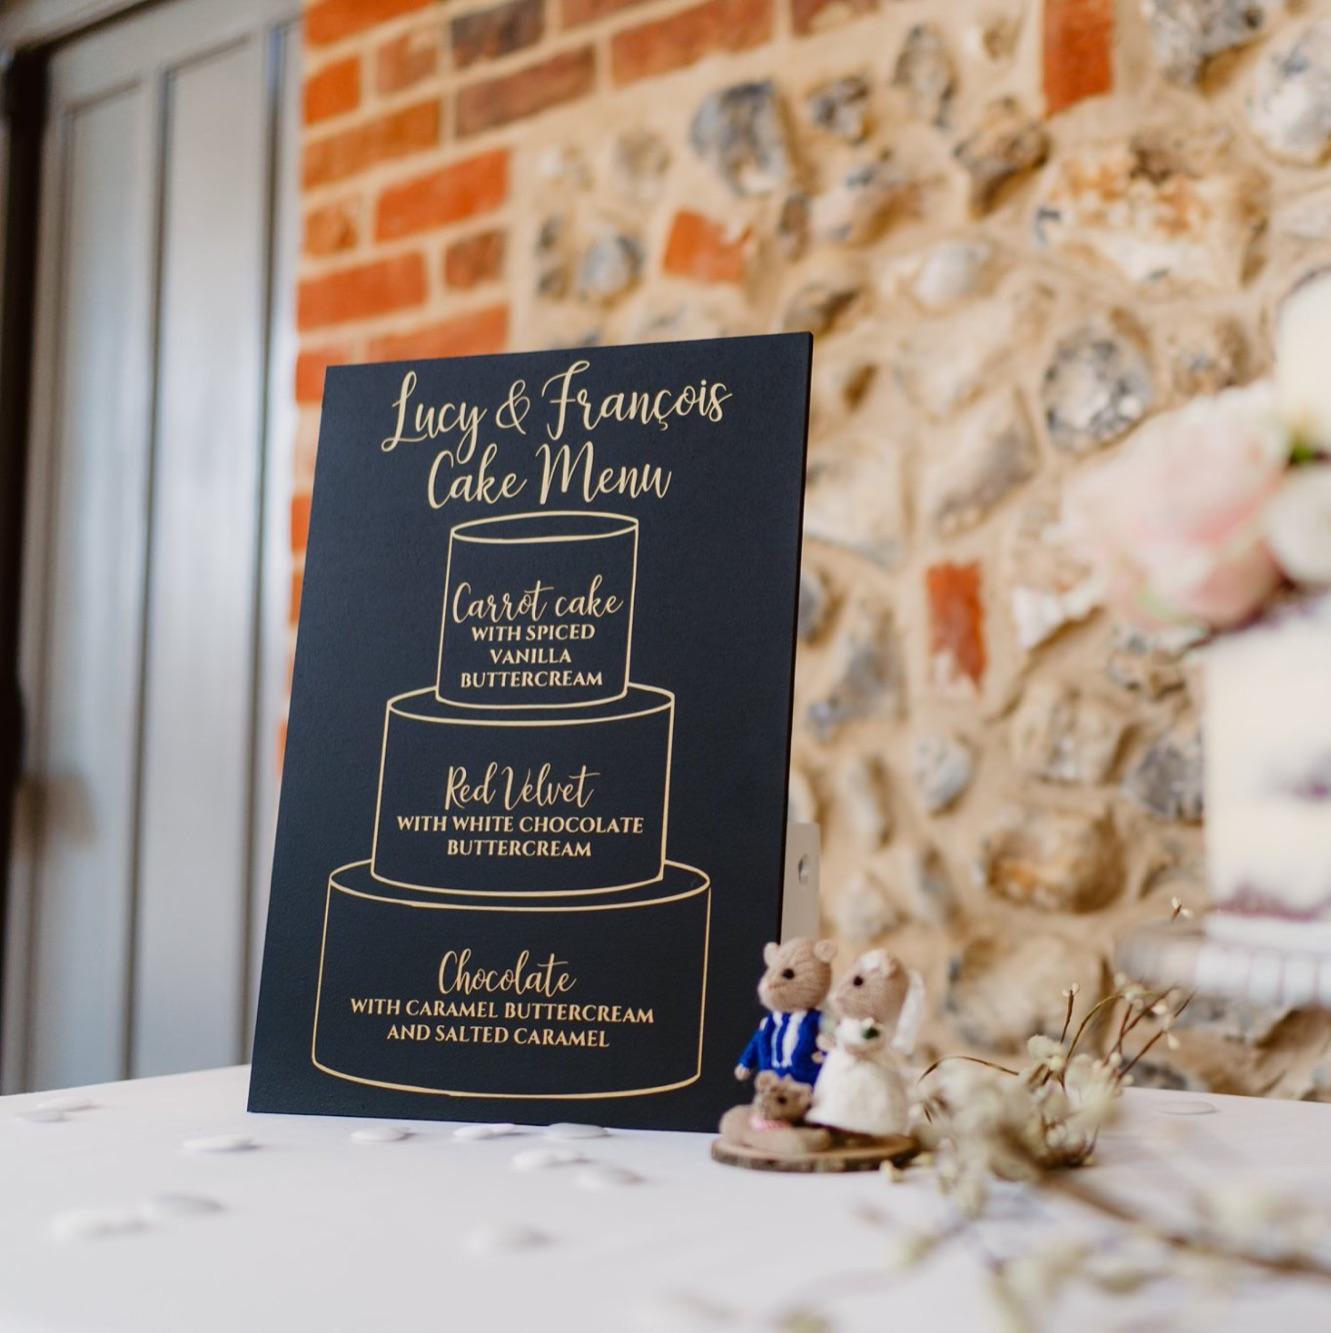 Cake menu on chalkboard with gold vinyl design